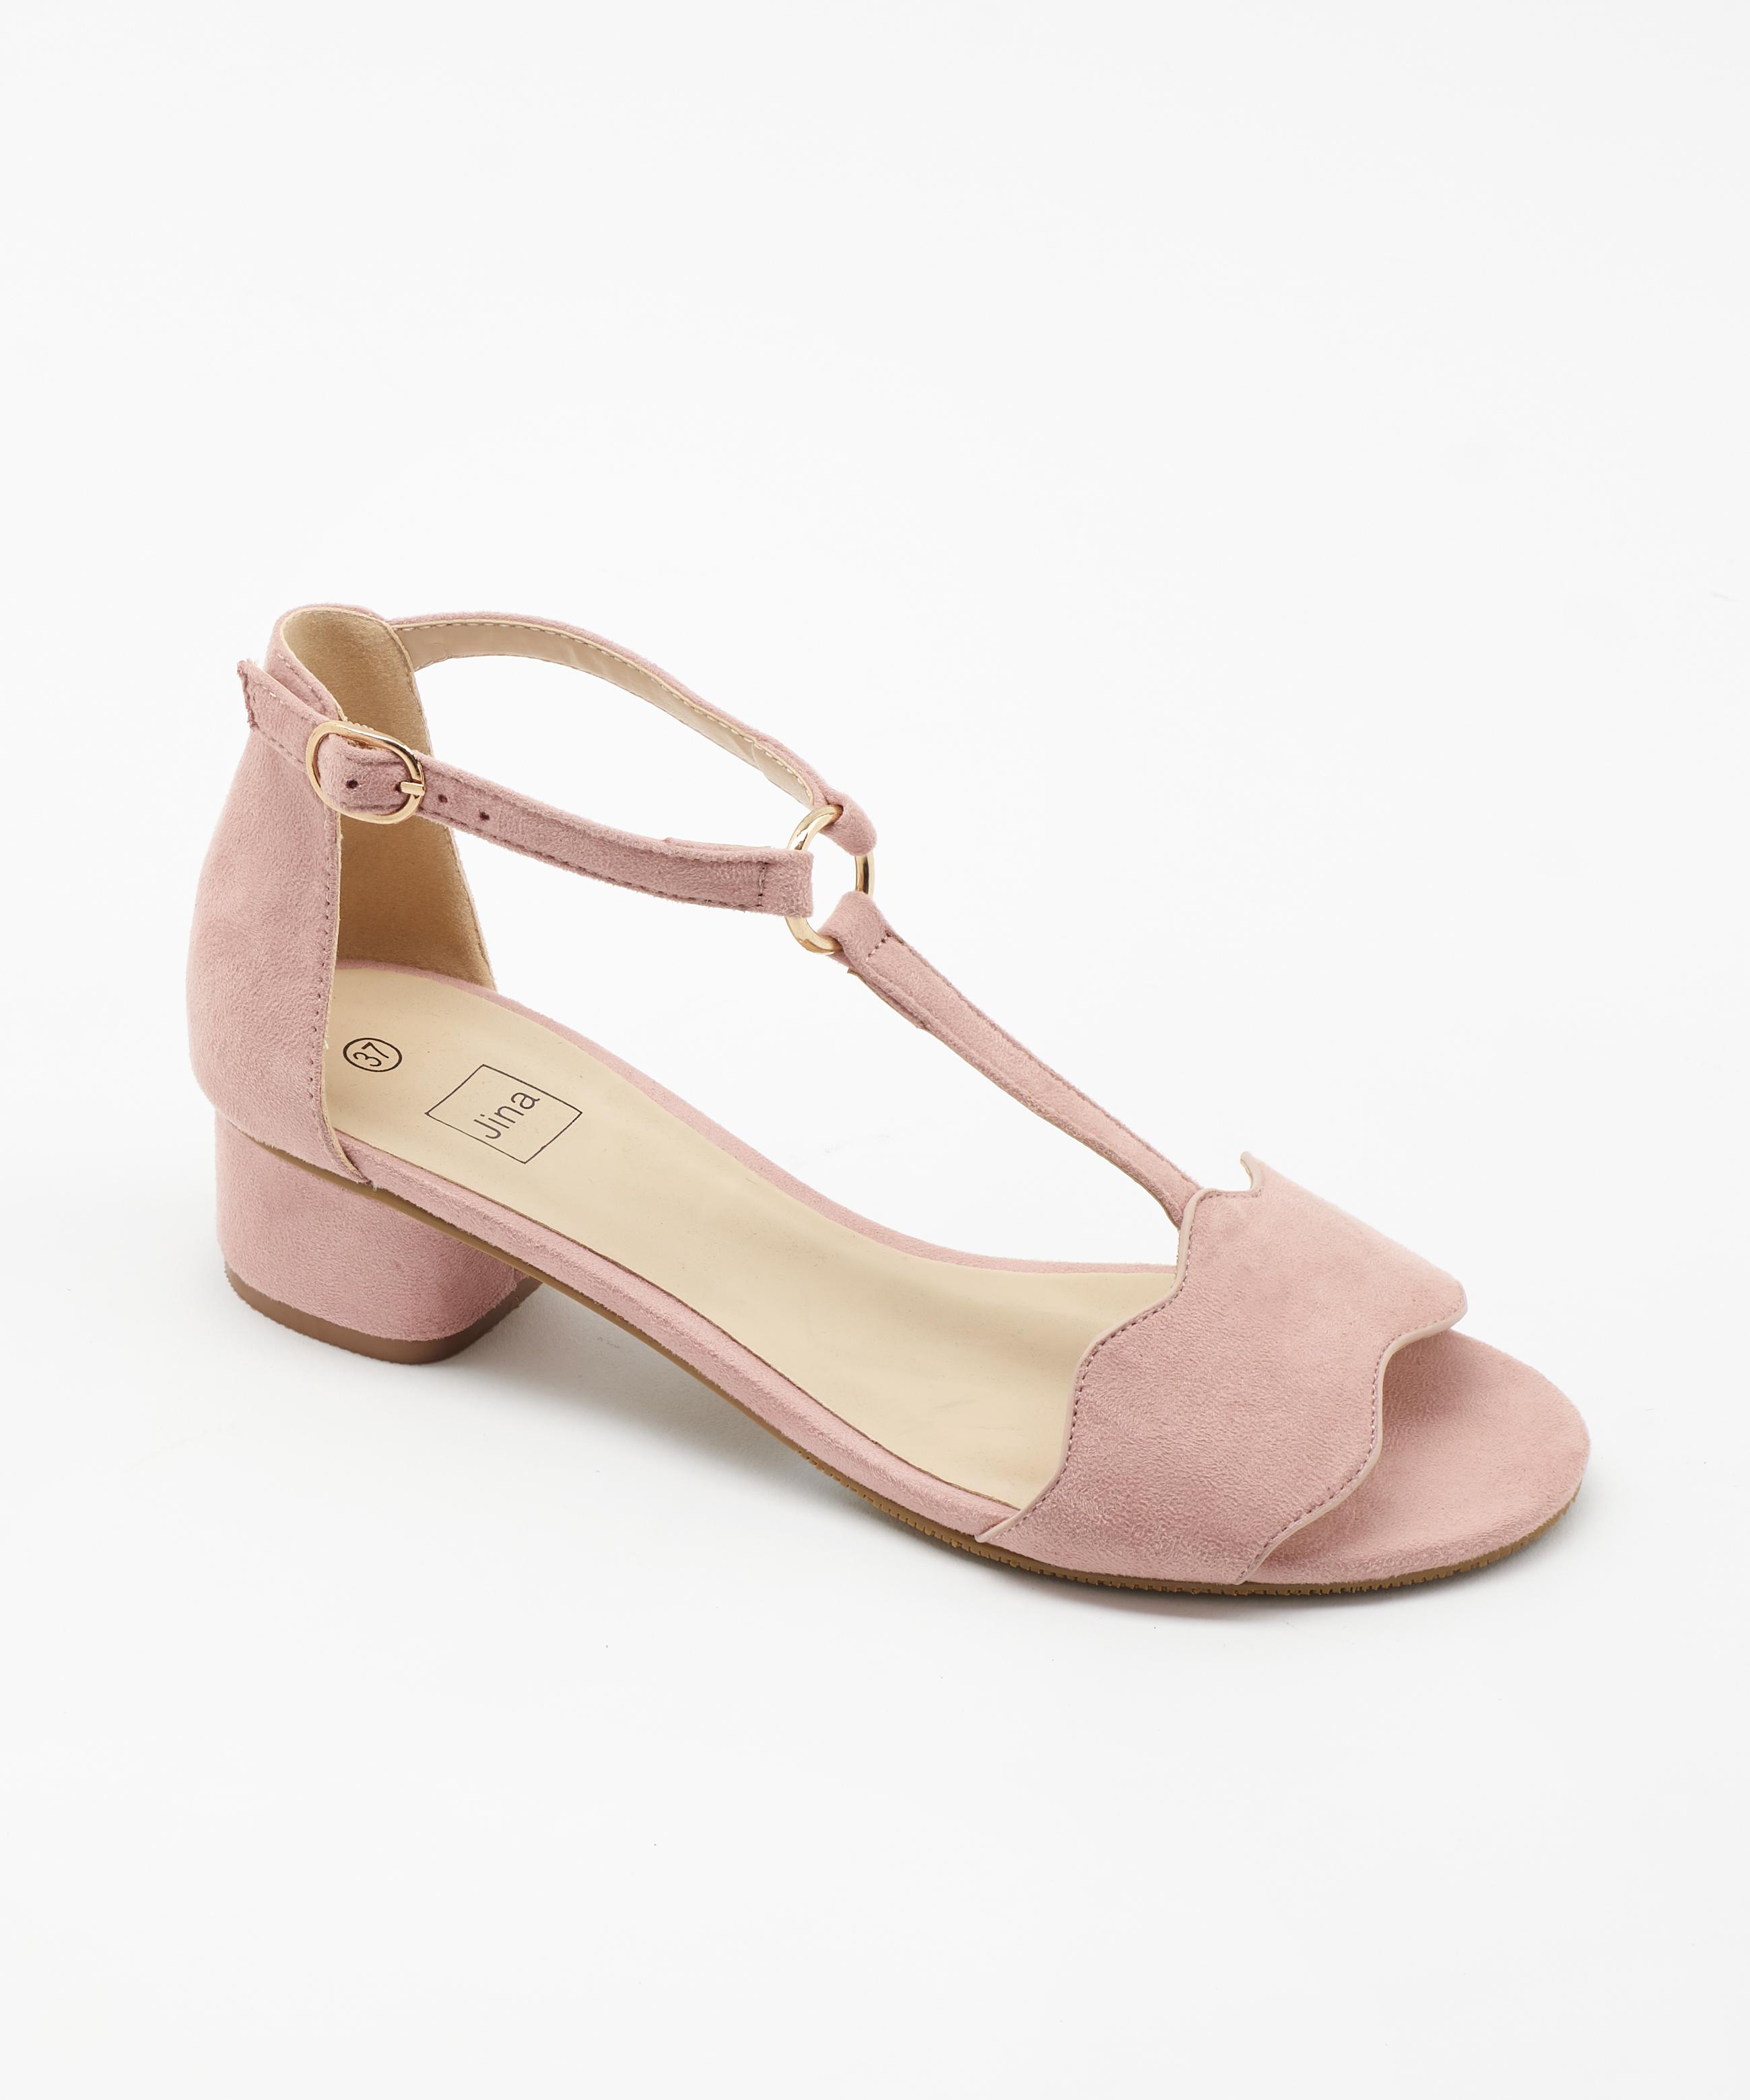 Sandales À Talons Femme - Sandale Talon Decrochee Rose Jina - Style 4